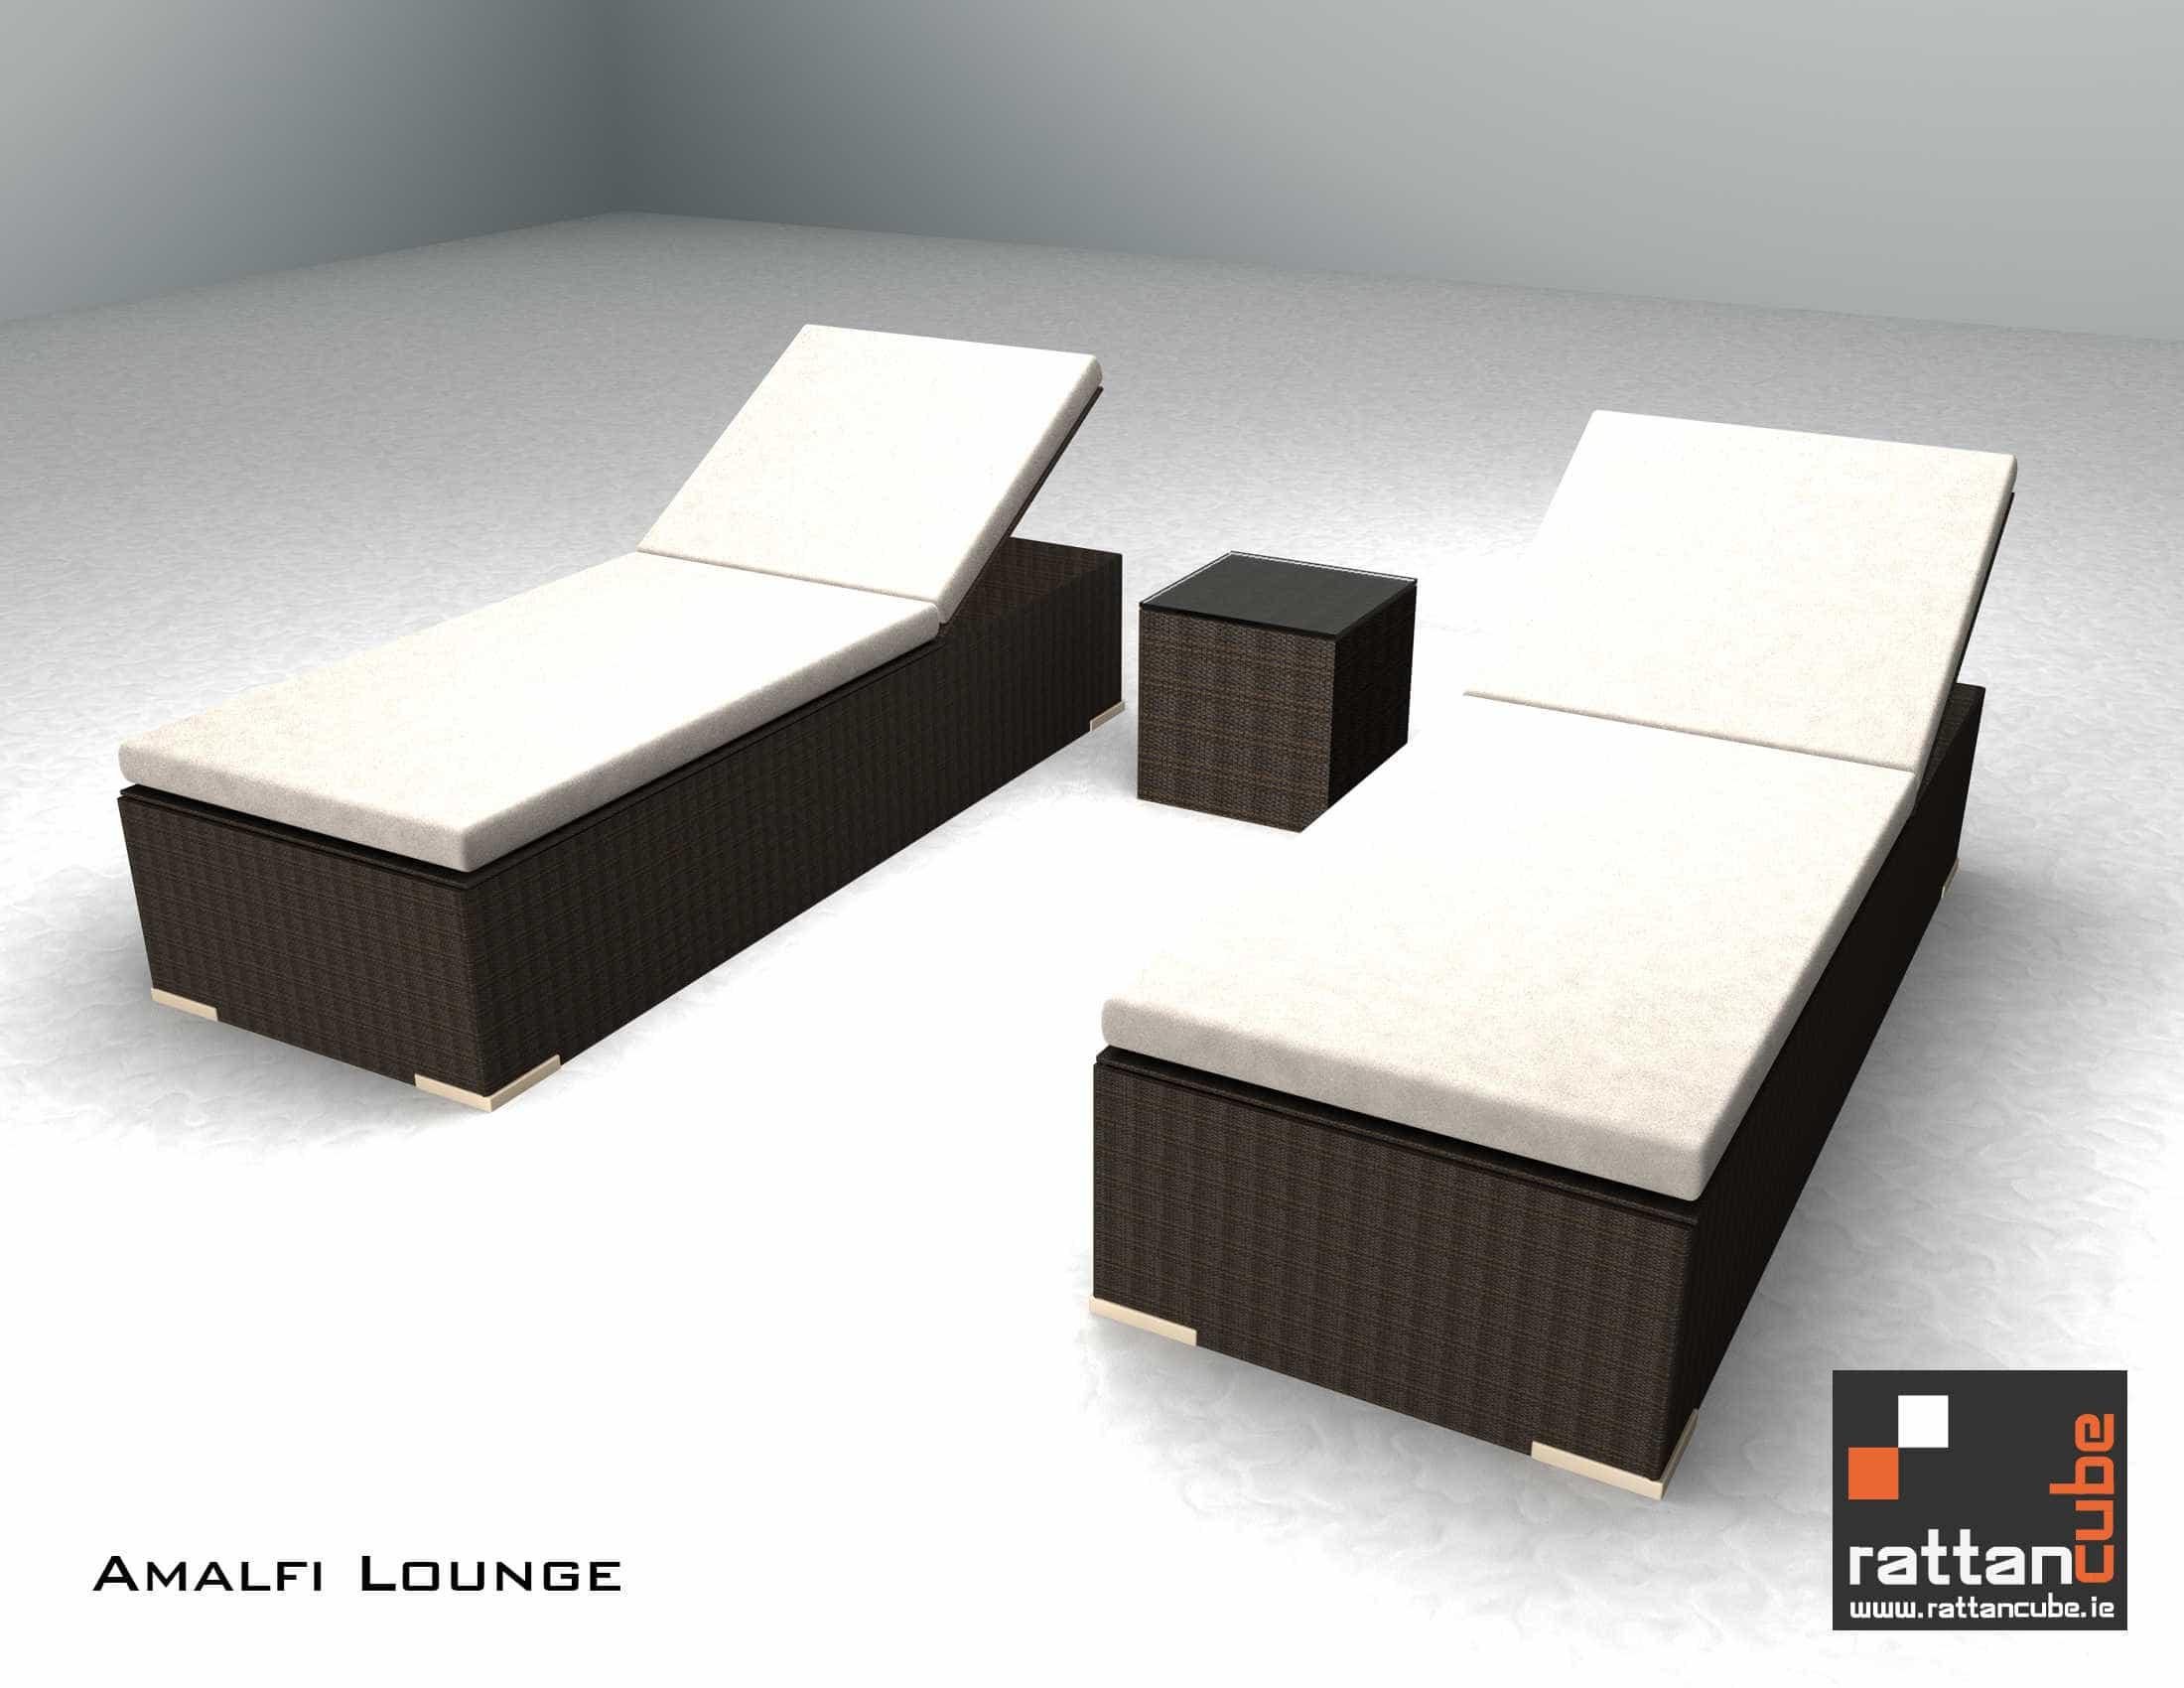 folding banana lounge chair gold covers amazon outdoor furniture amalfi loungers